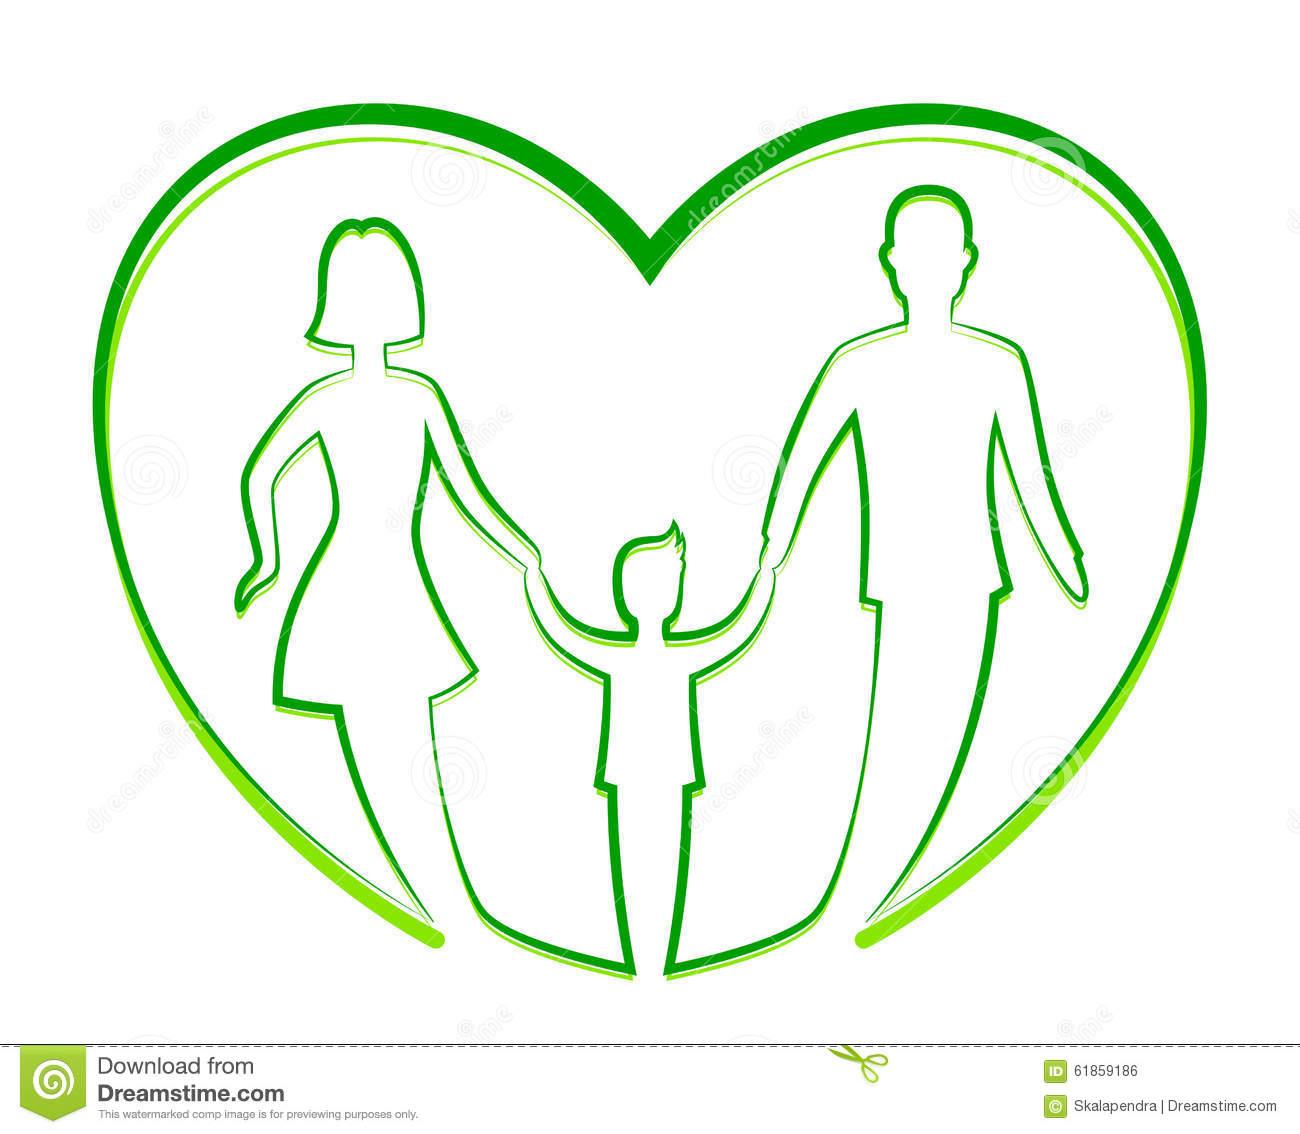 Family unity stock vector. Illustration of charity, adoption.